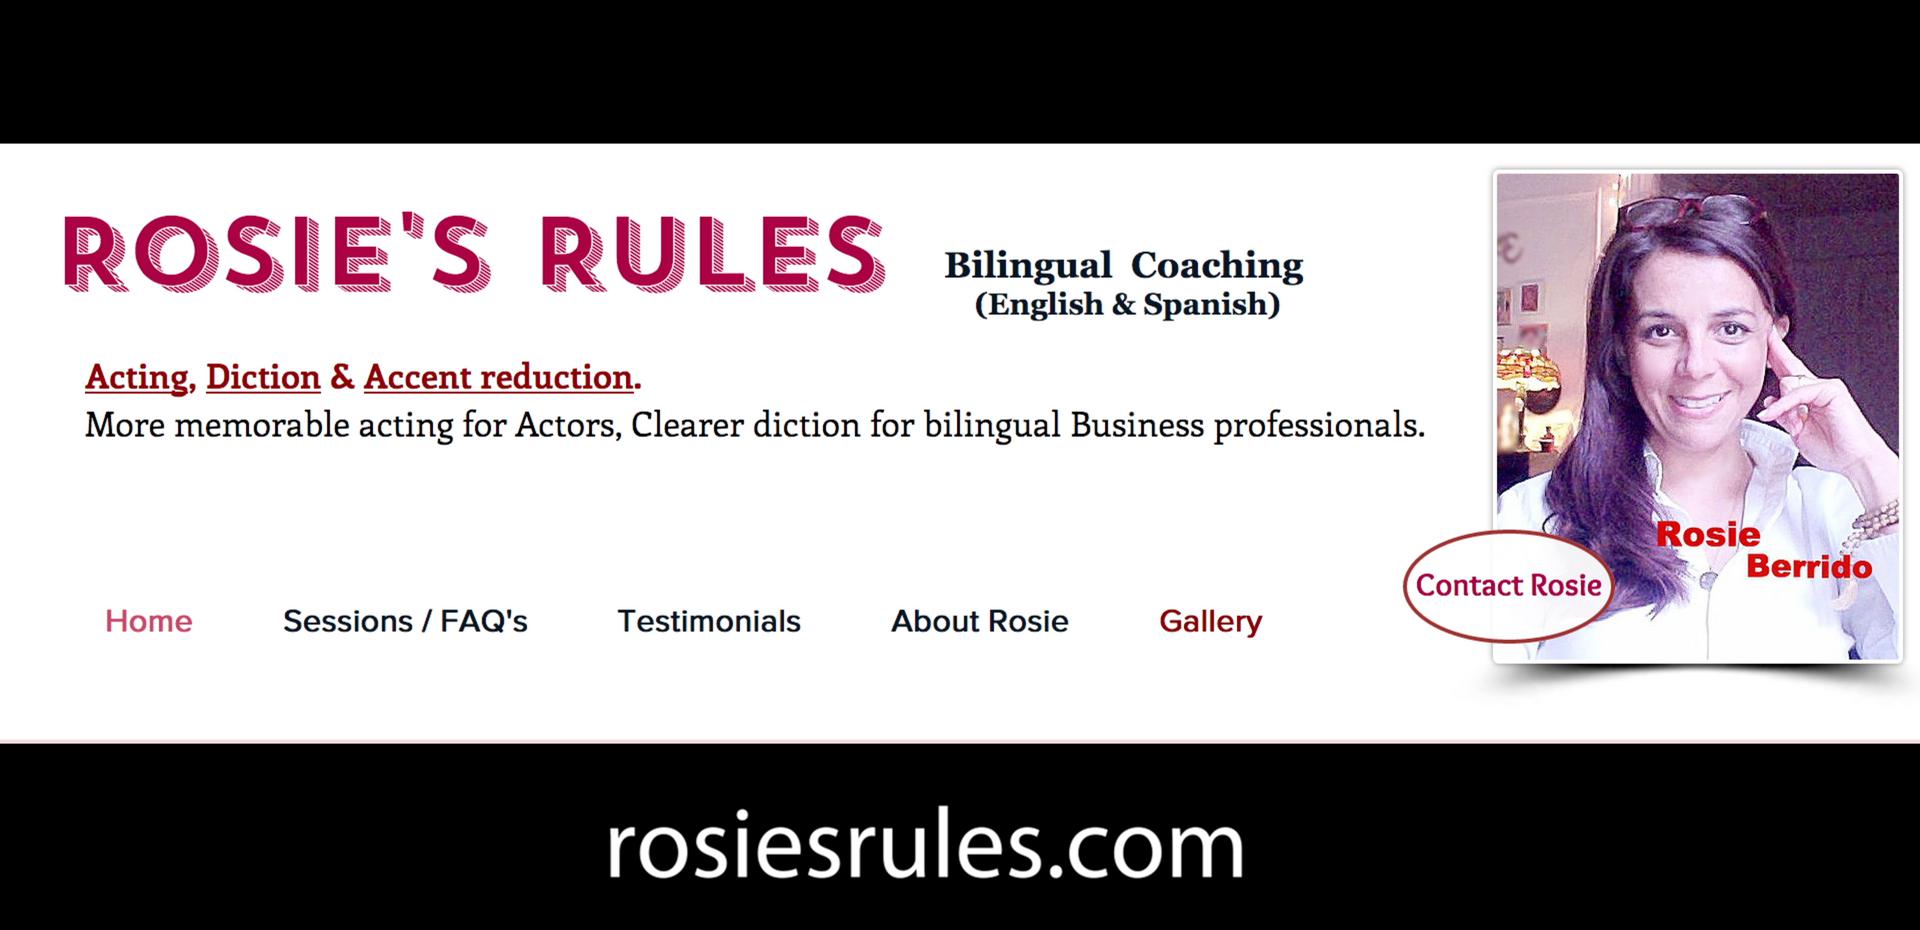 Rosie's Rules - Bilingual Coaching